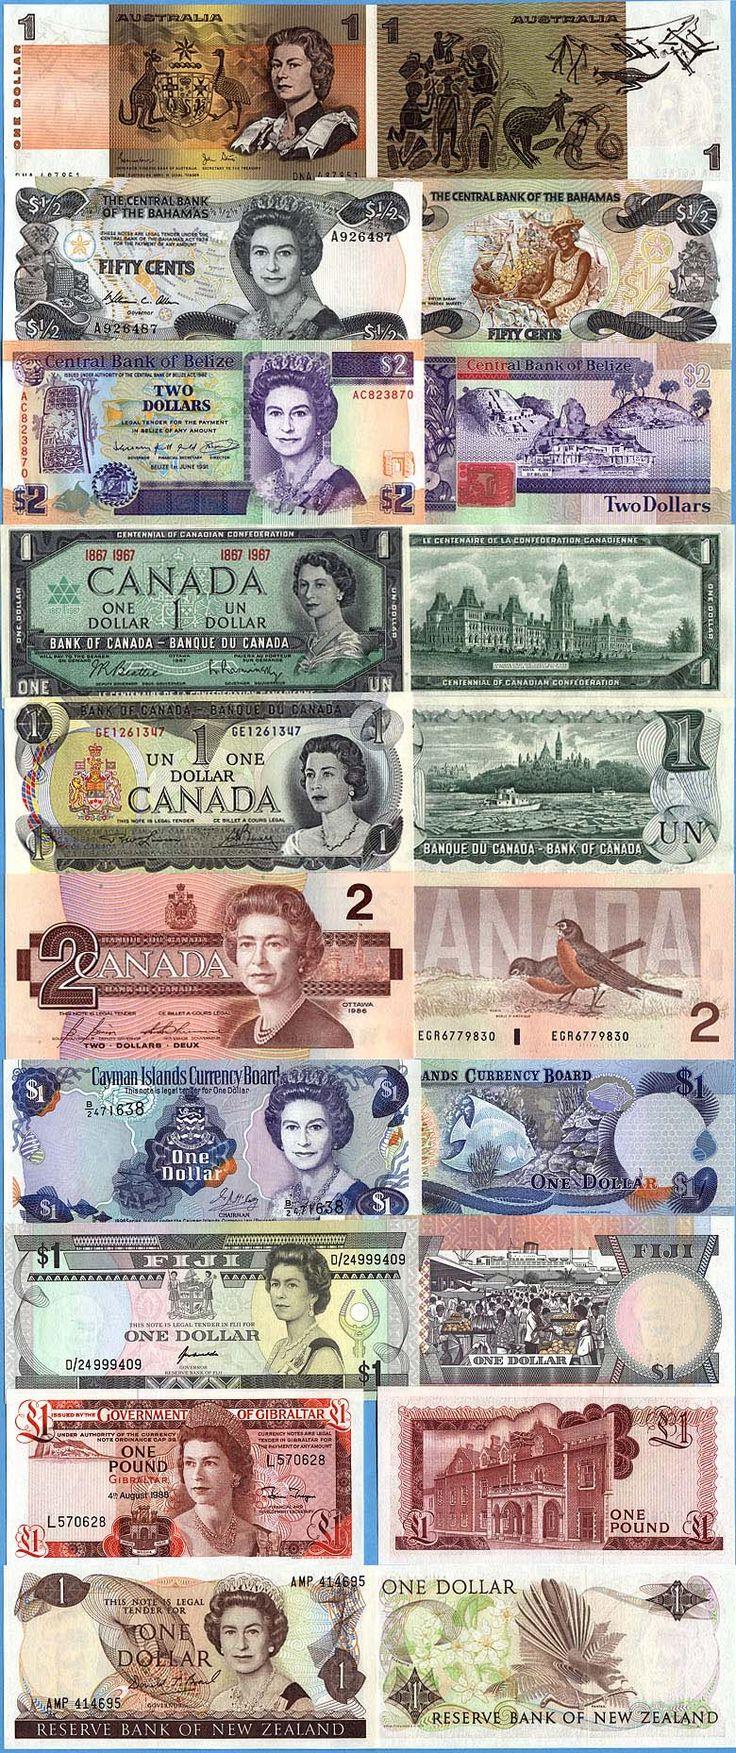 World paper bills | World banknotes and paper money, countries A-F ============================= profgasparetto / eagasparetto / Dom Gaspar I ================================== www.profgasparetto21.wordpress.com ================================== https://independent.academia.edu/profeagasparetto